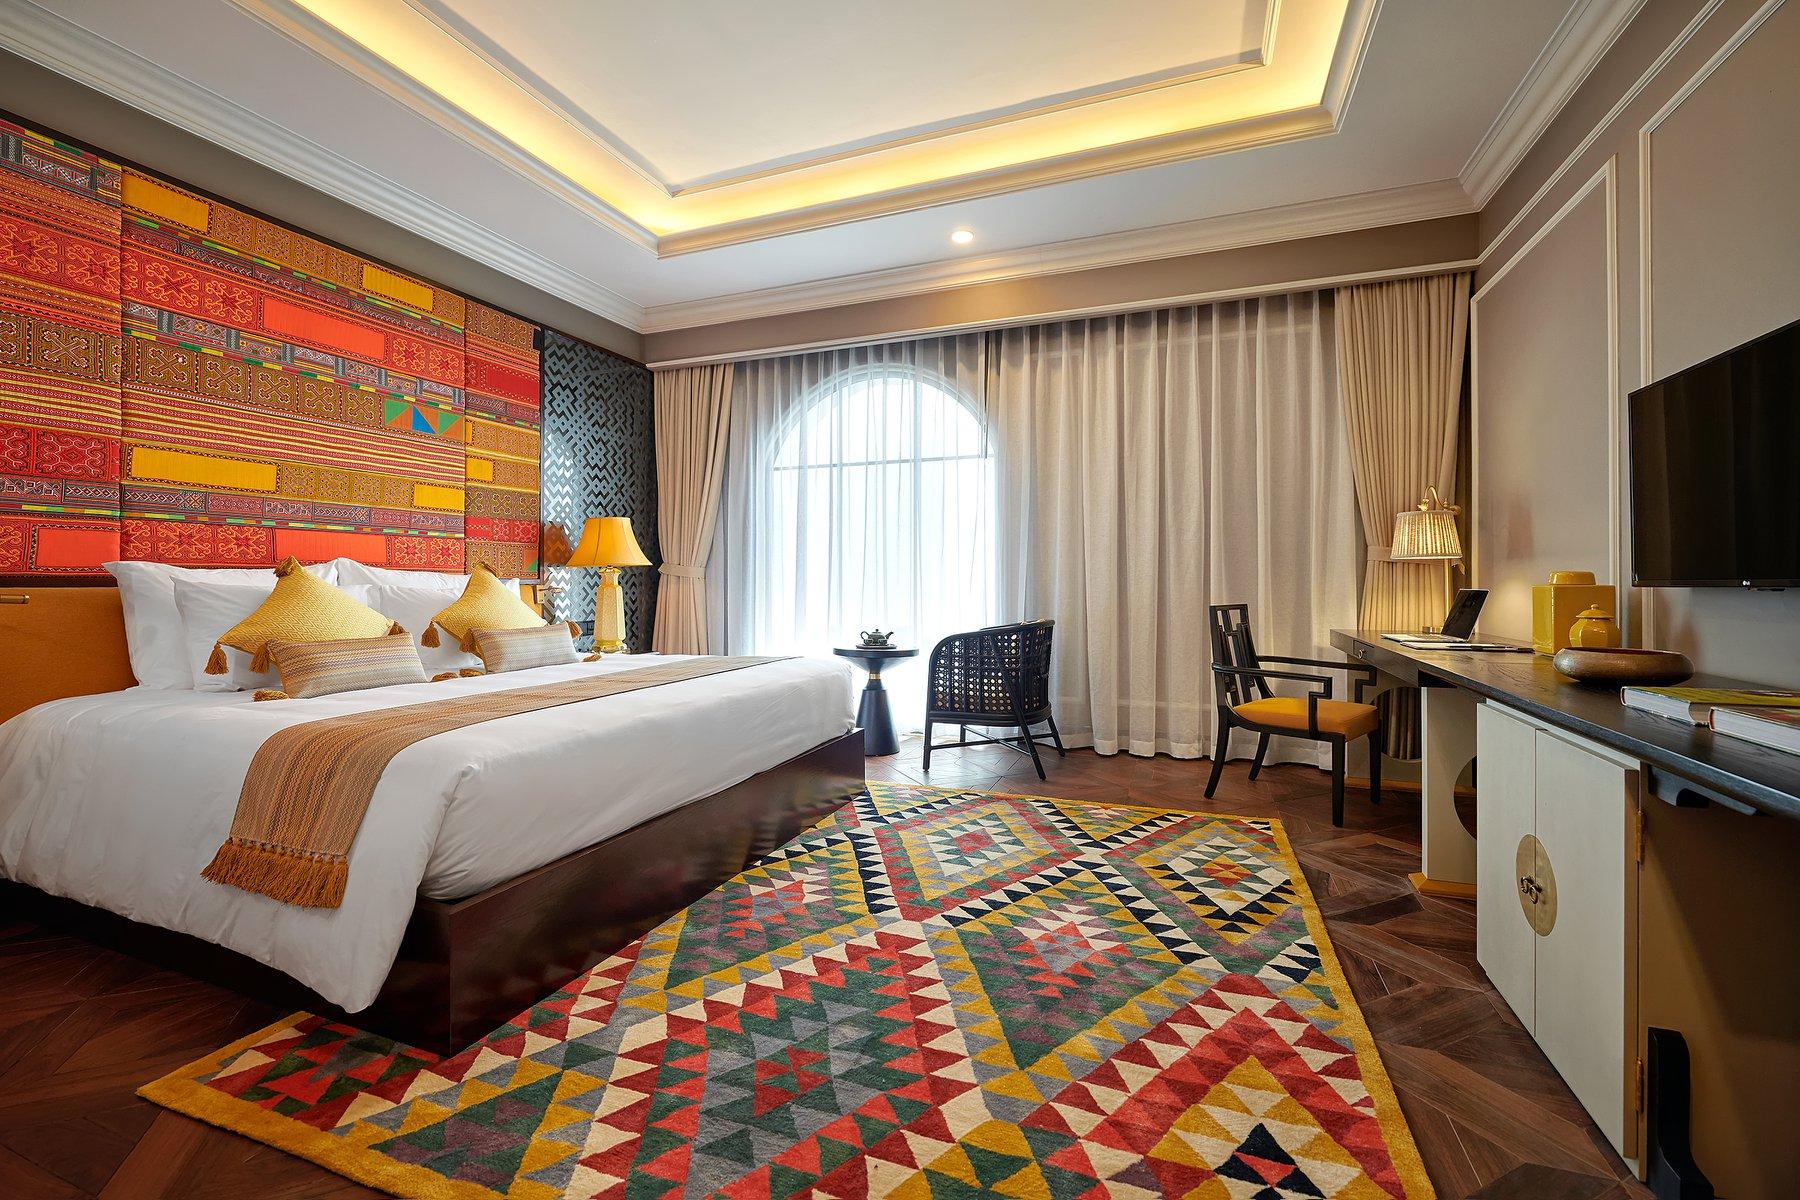 Ảnh: @Silk Path Grand Resort & Spa Sapa